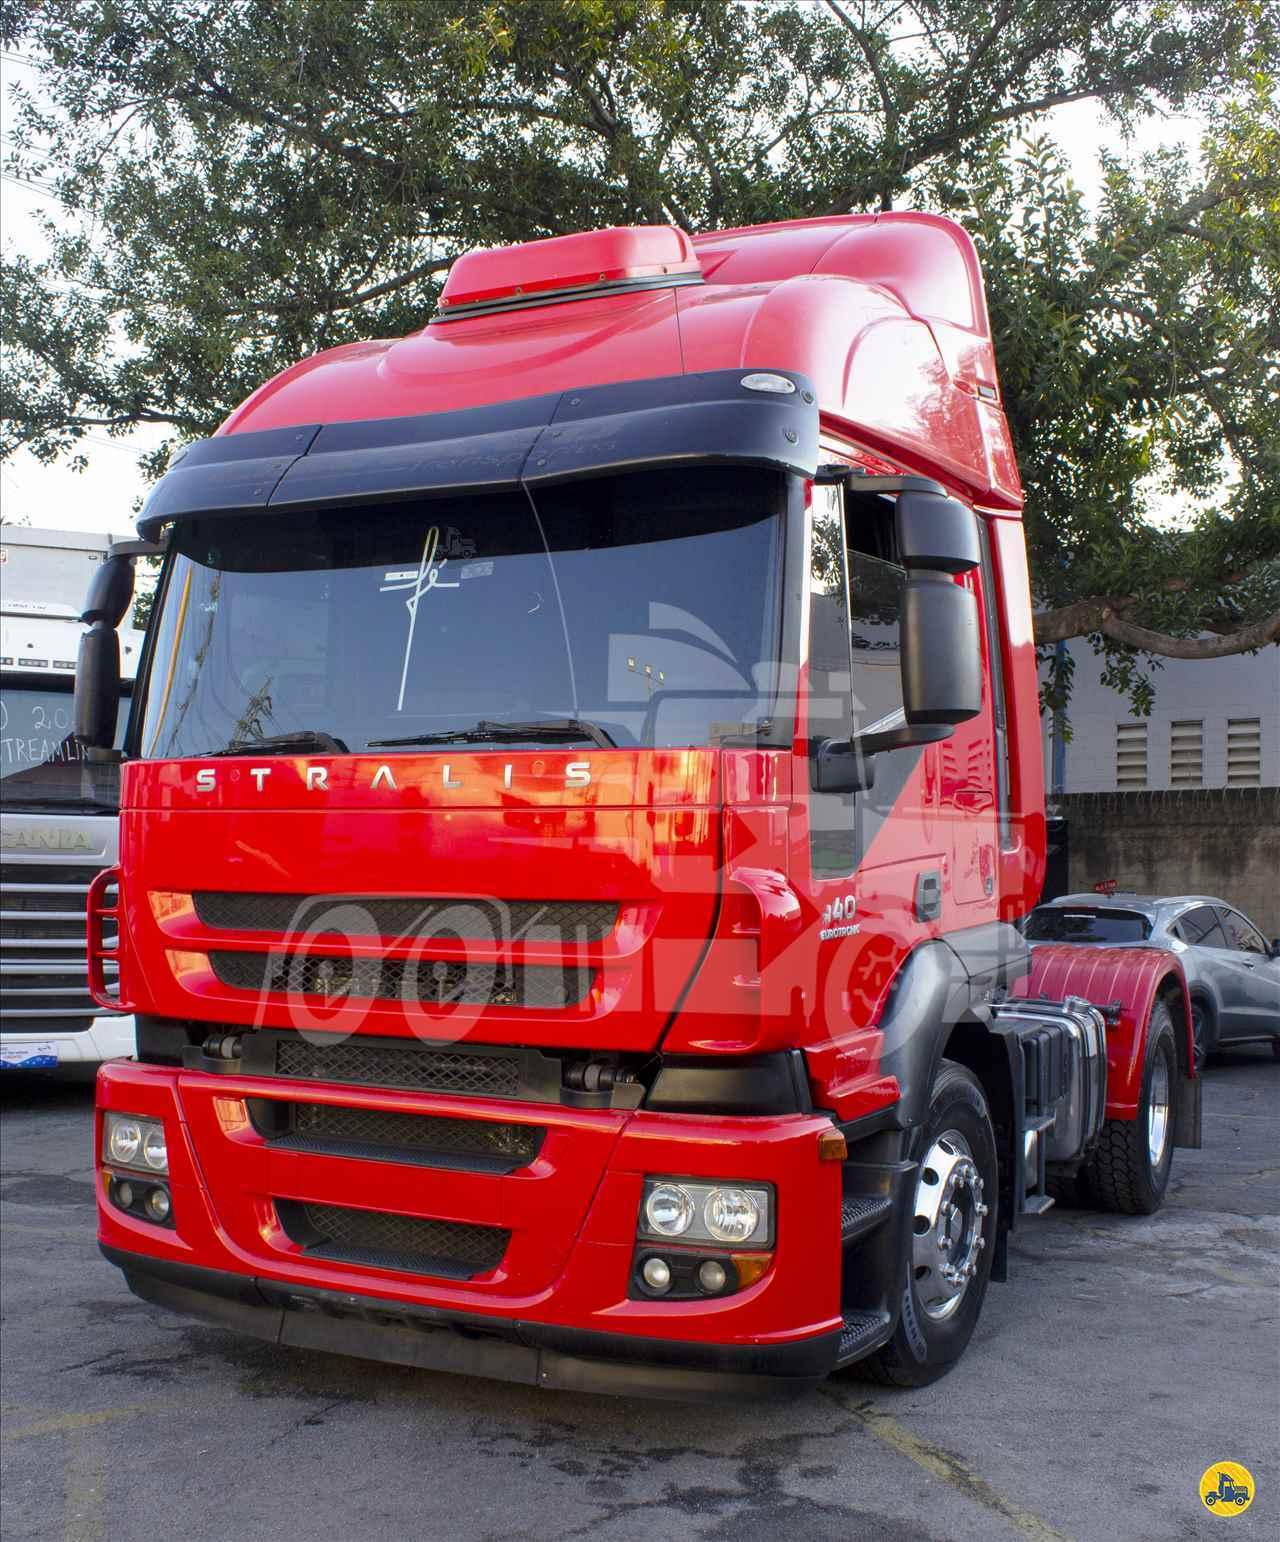 STRALIS 440 de TVG Caminhões - GUARULHOS/SP